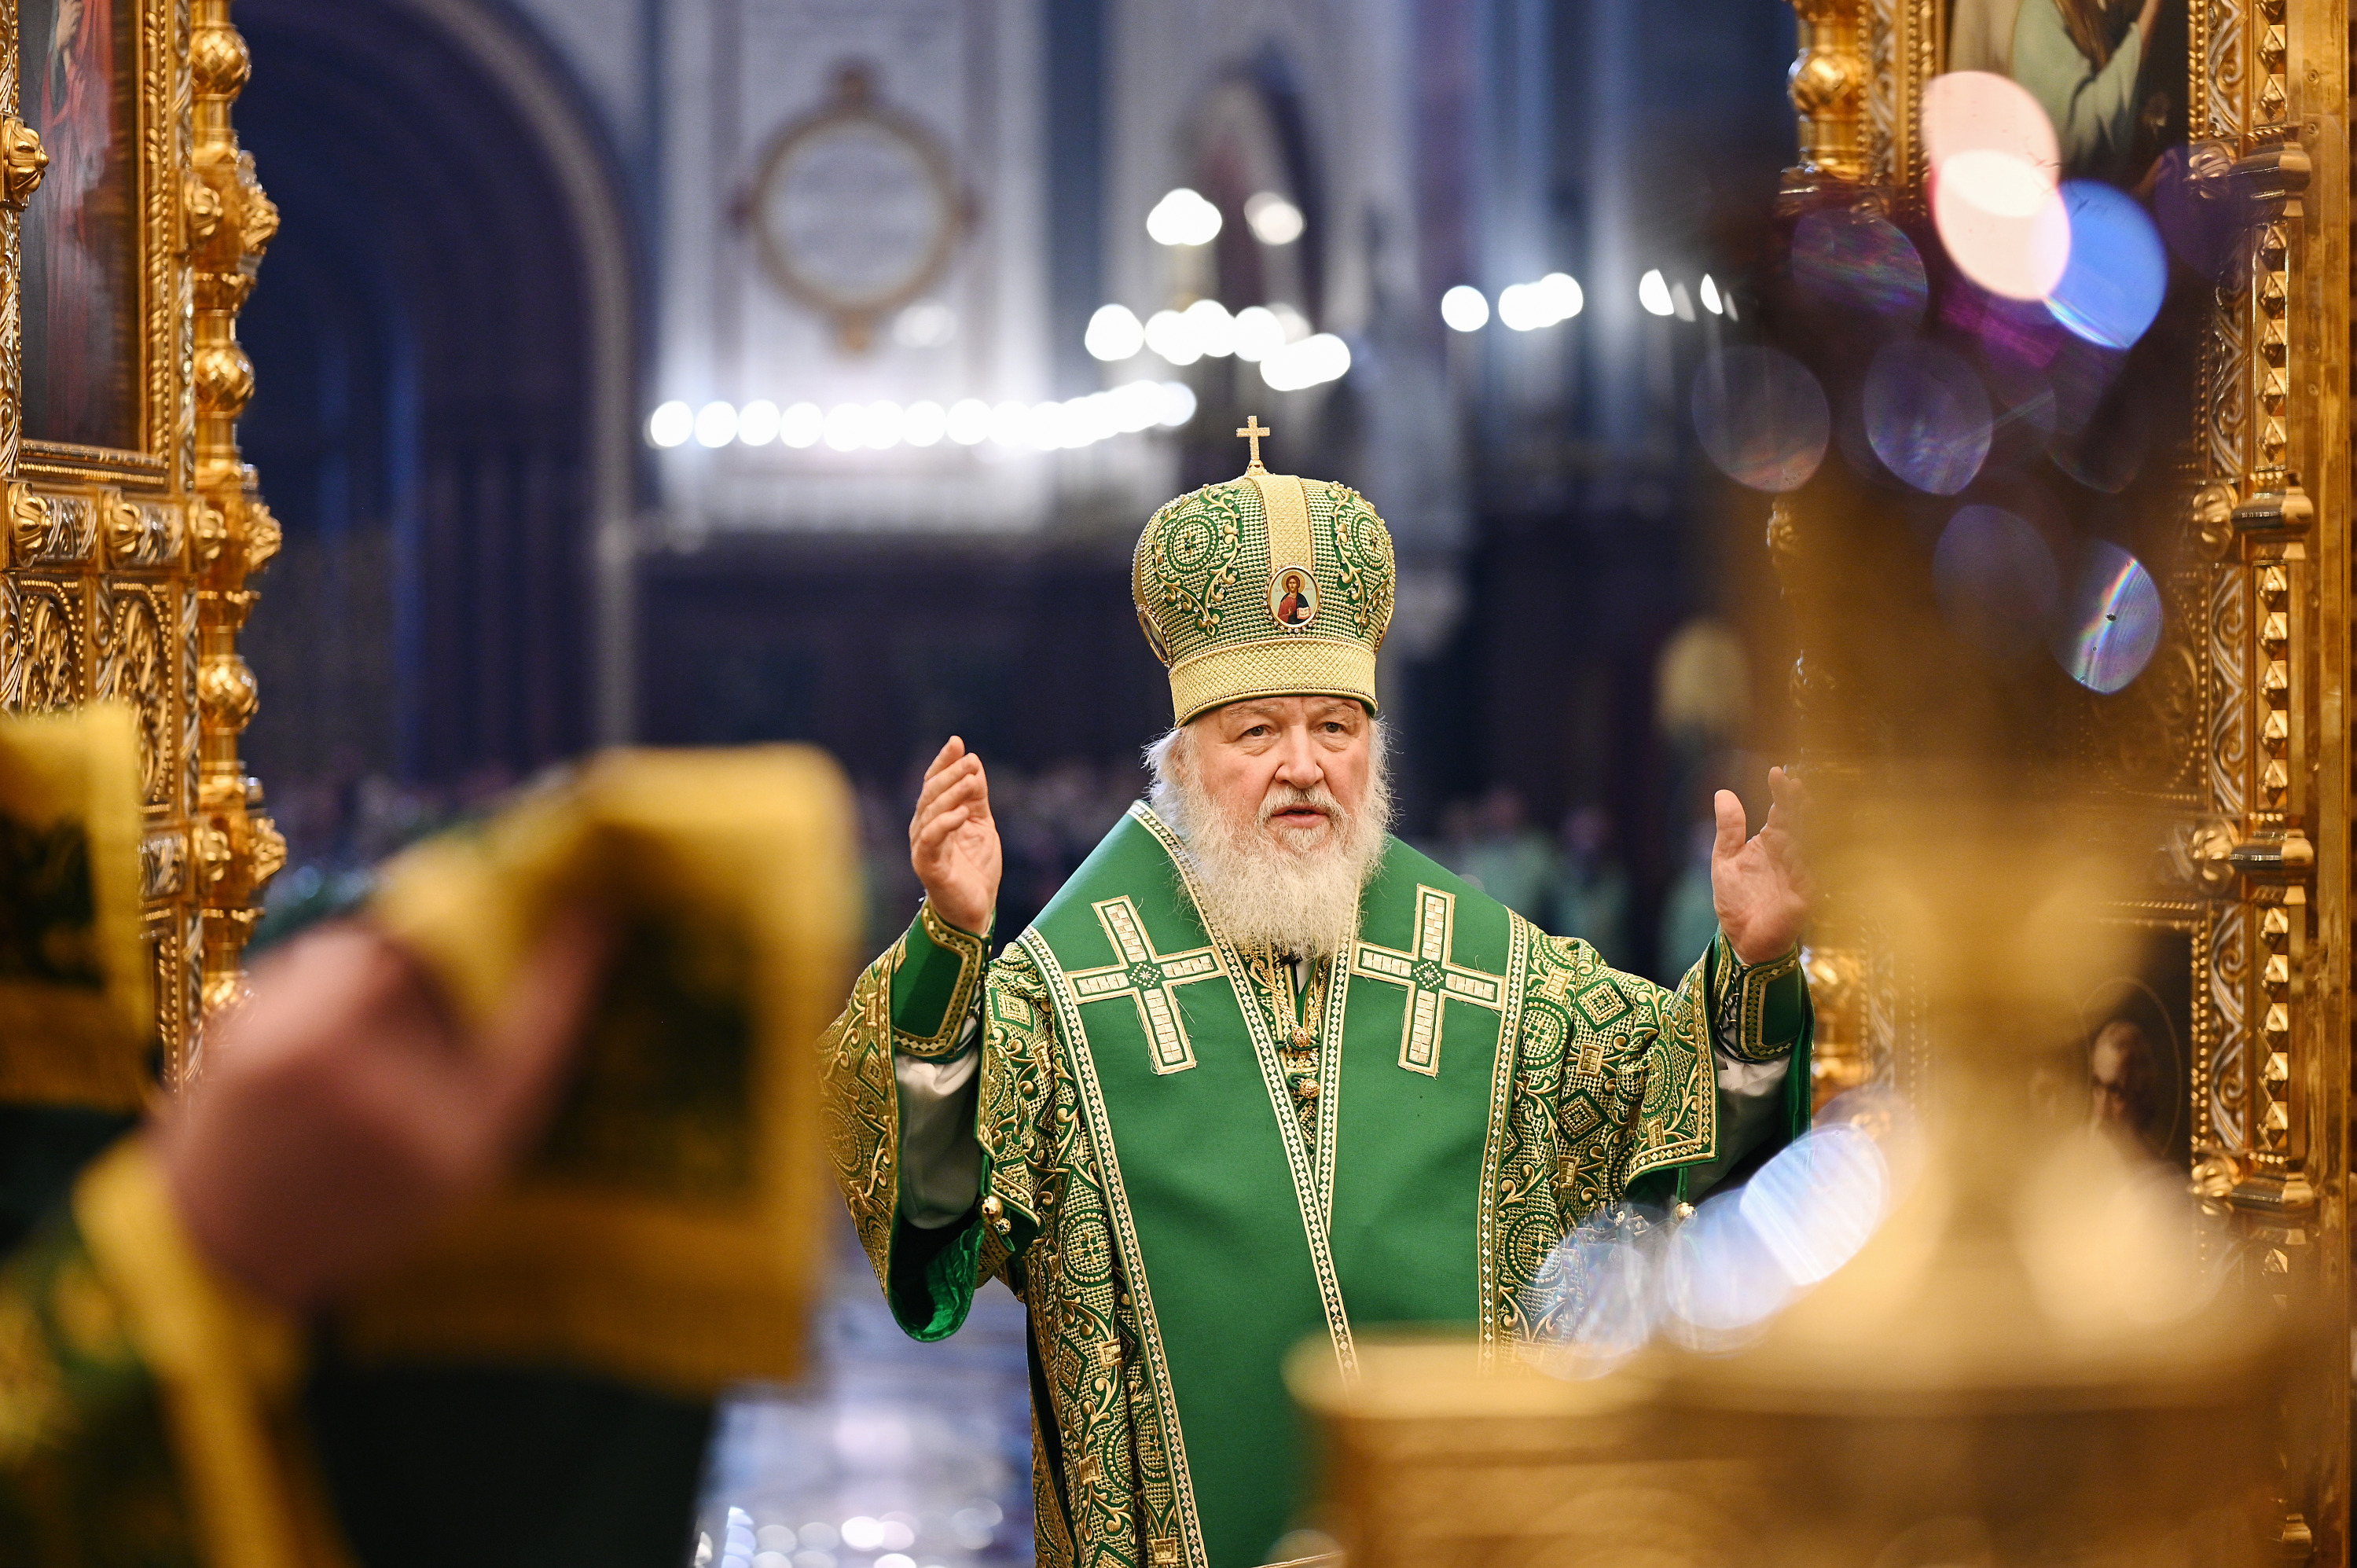 Глава РПЦ в преддверии Пасхи провел проповедь на неожиданную тему